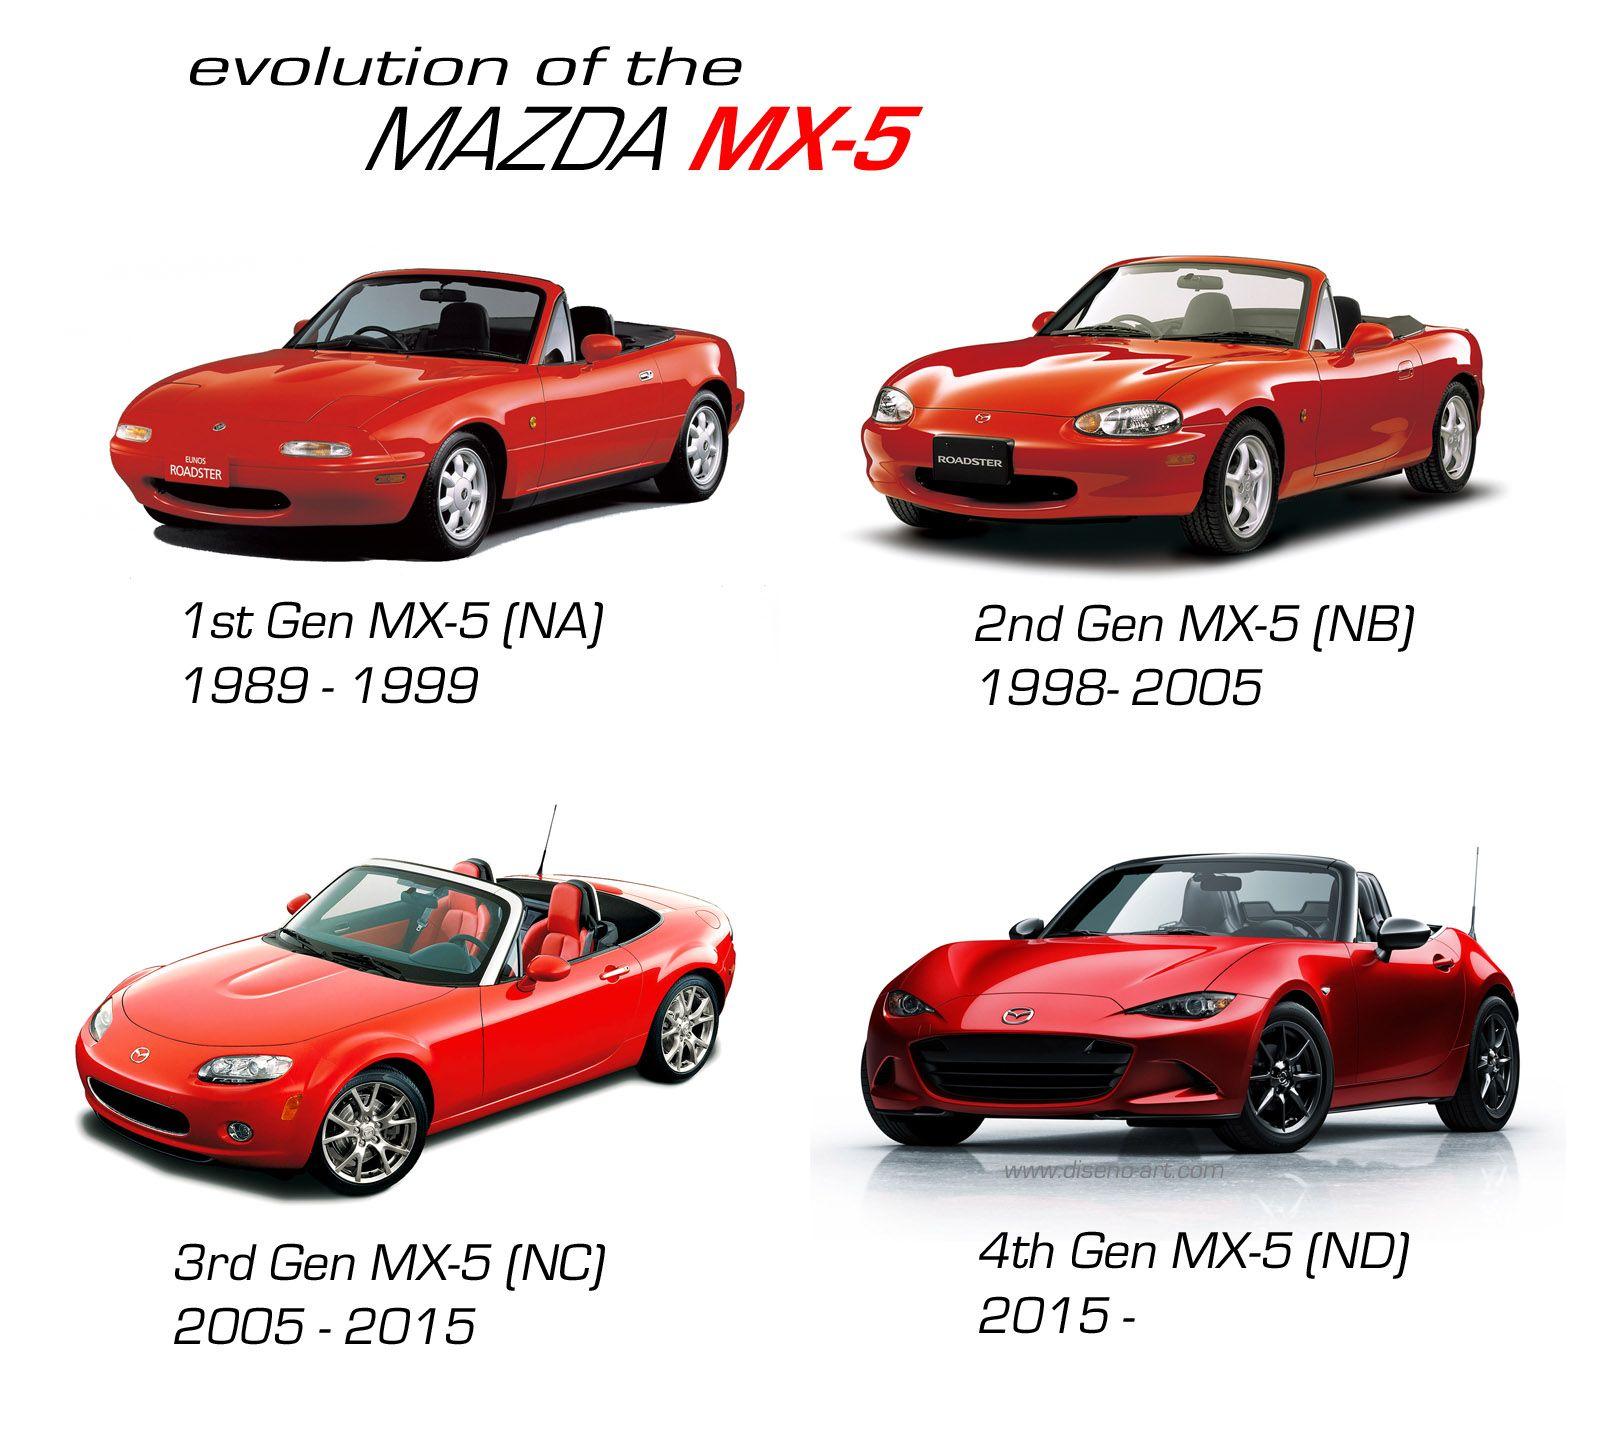 Mazda Auto: Mazda, Mazda Miata, Mazda Mx3